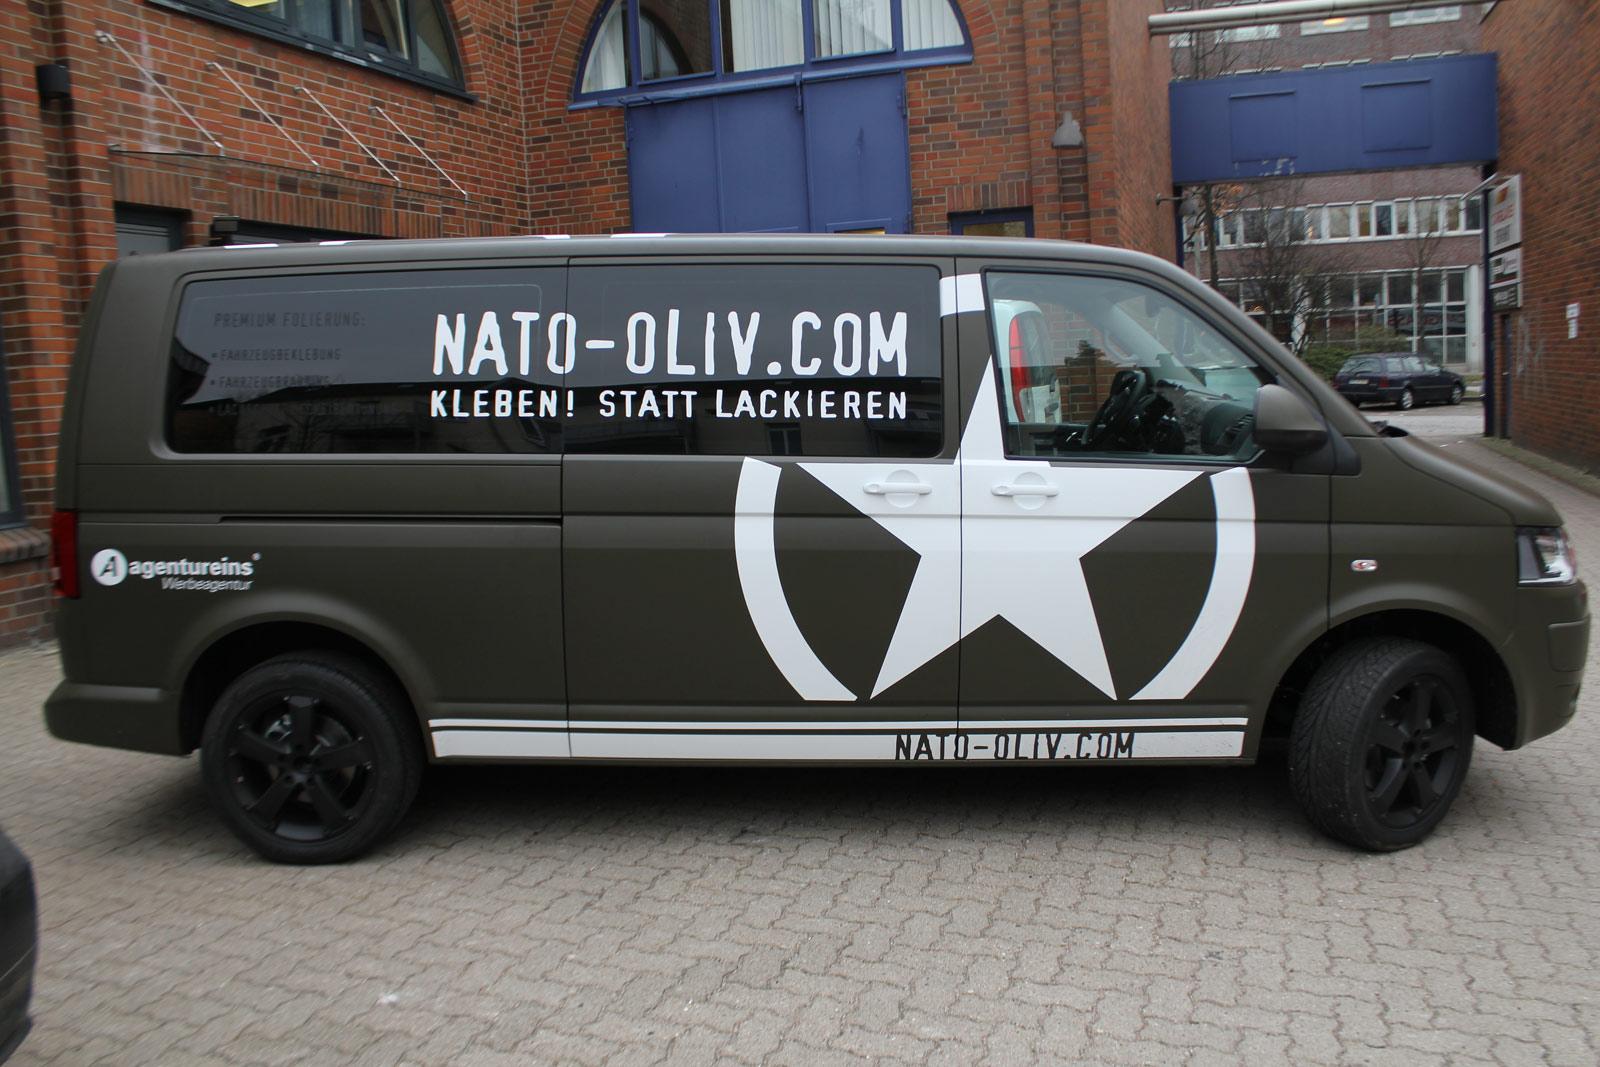 VW_T5_VOLLFOLIERUNG_NATO-OLIV_11